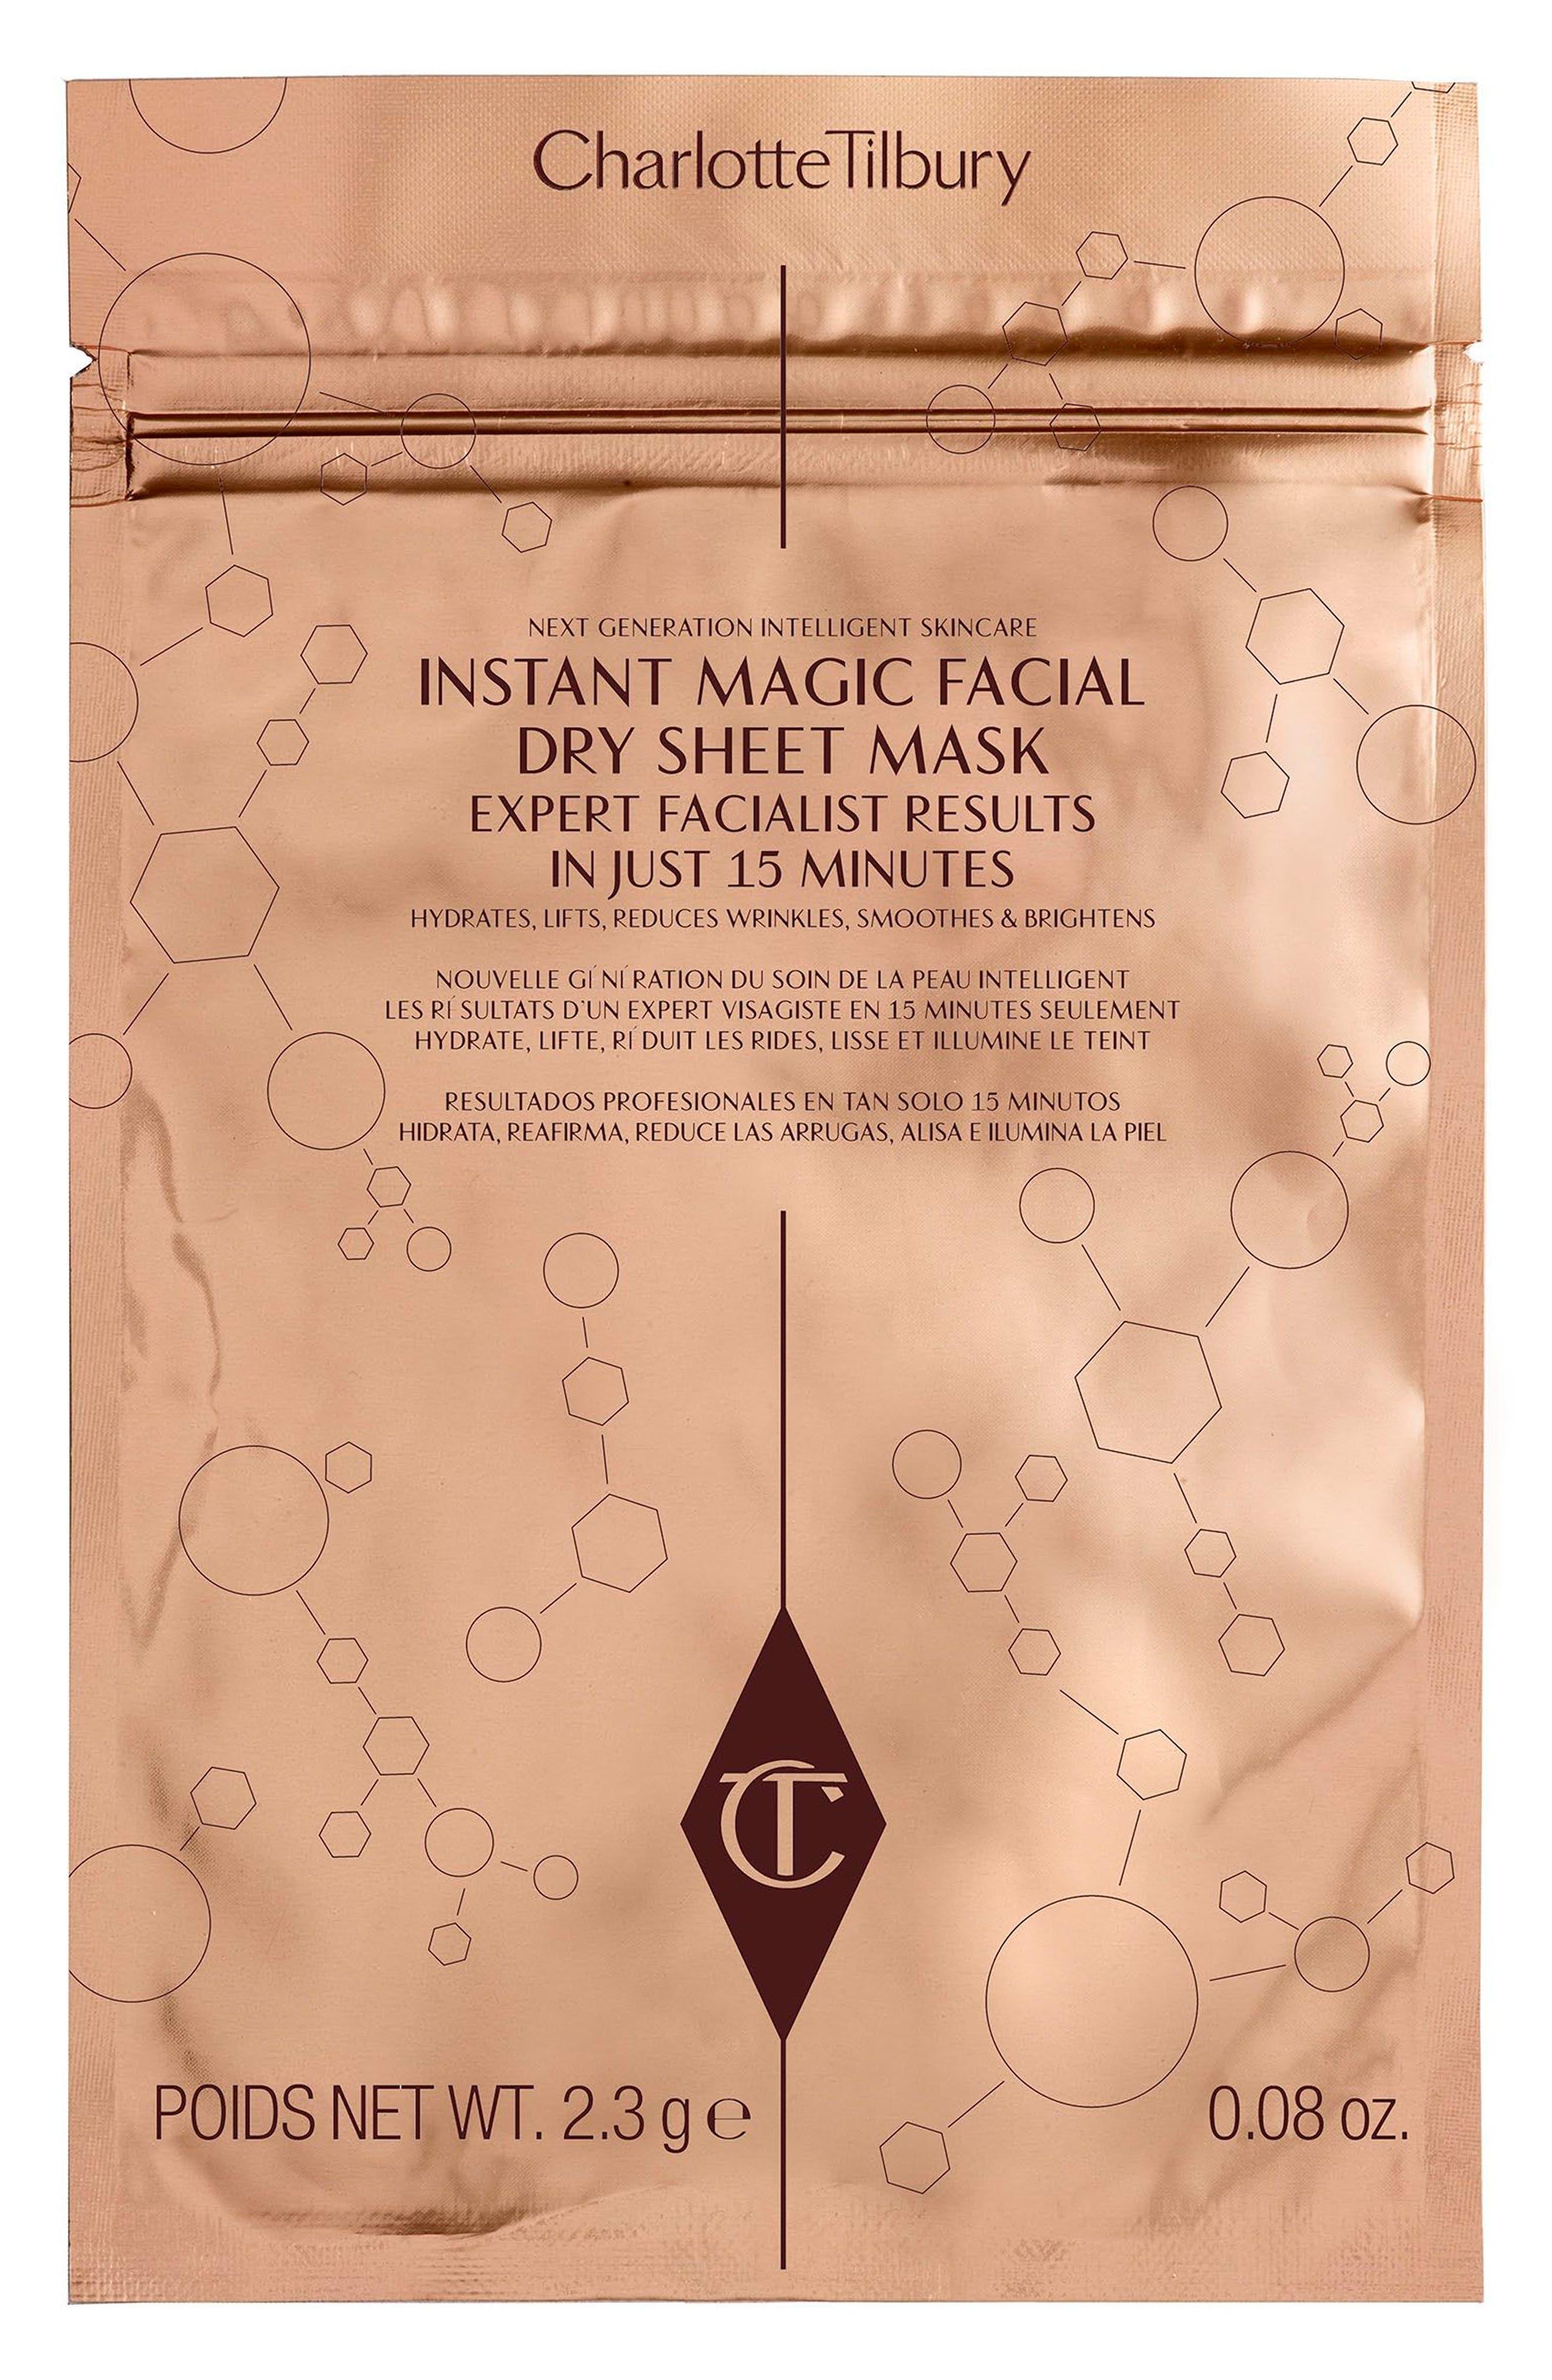 Instant Magic Facial Dry Sheet Mask